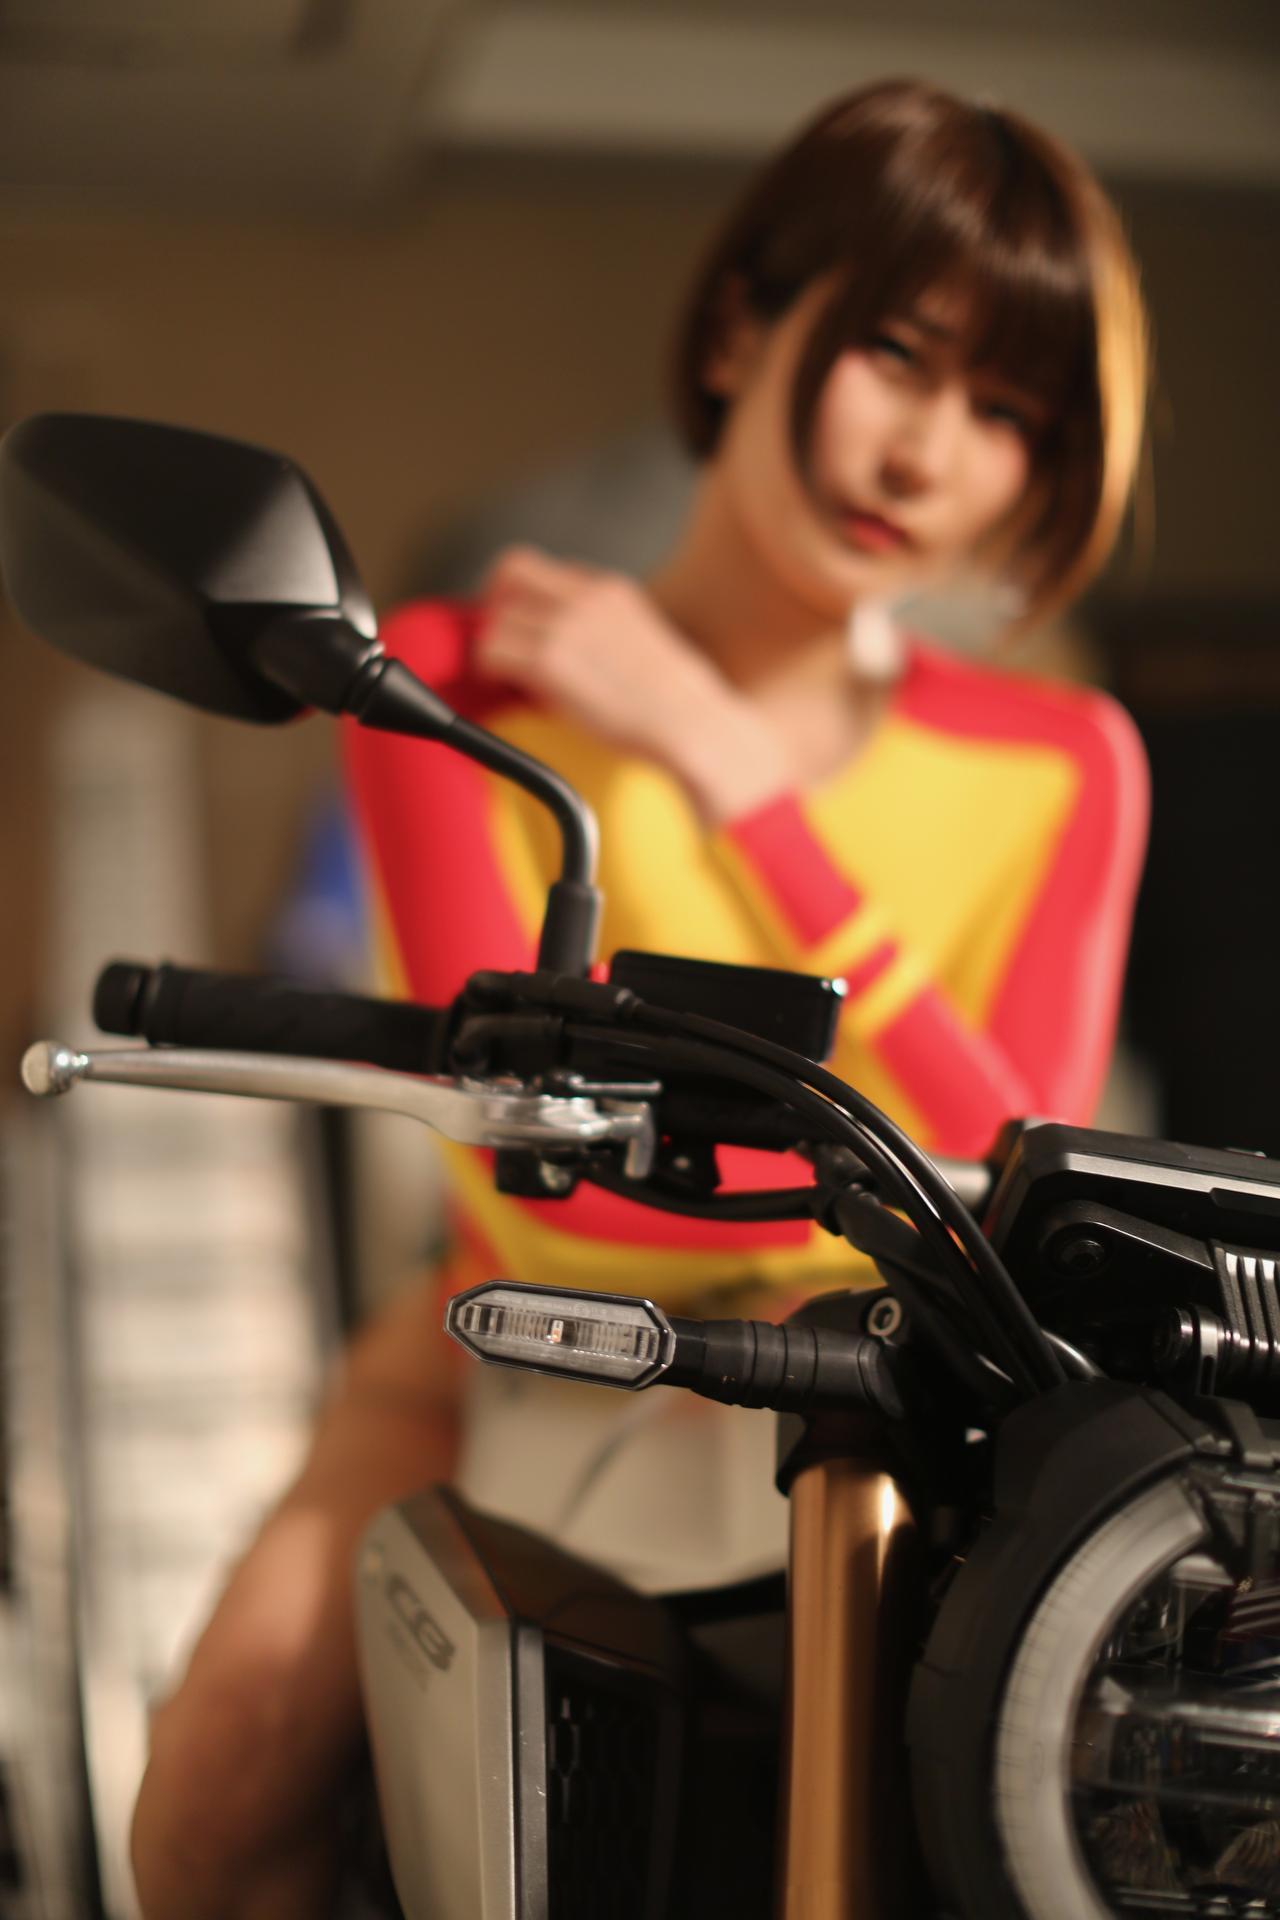 Images : 5番目の画像 - 「【Beauty & Bike】うさことCB650R Vol.01」のアルバム - LAWRENCE - Motorcycle x Cars + α = Your Life.